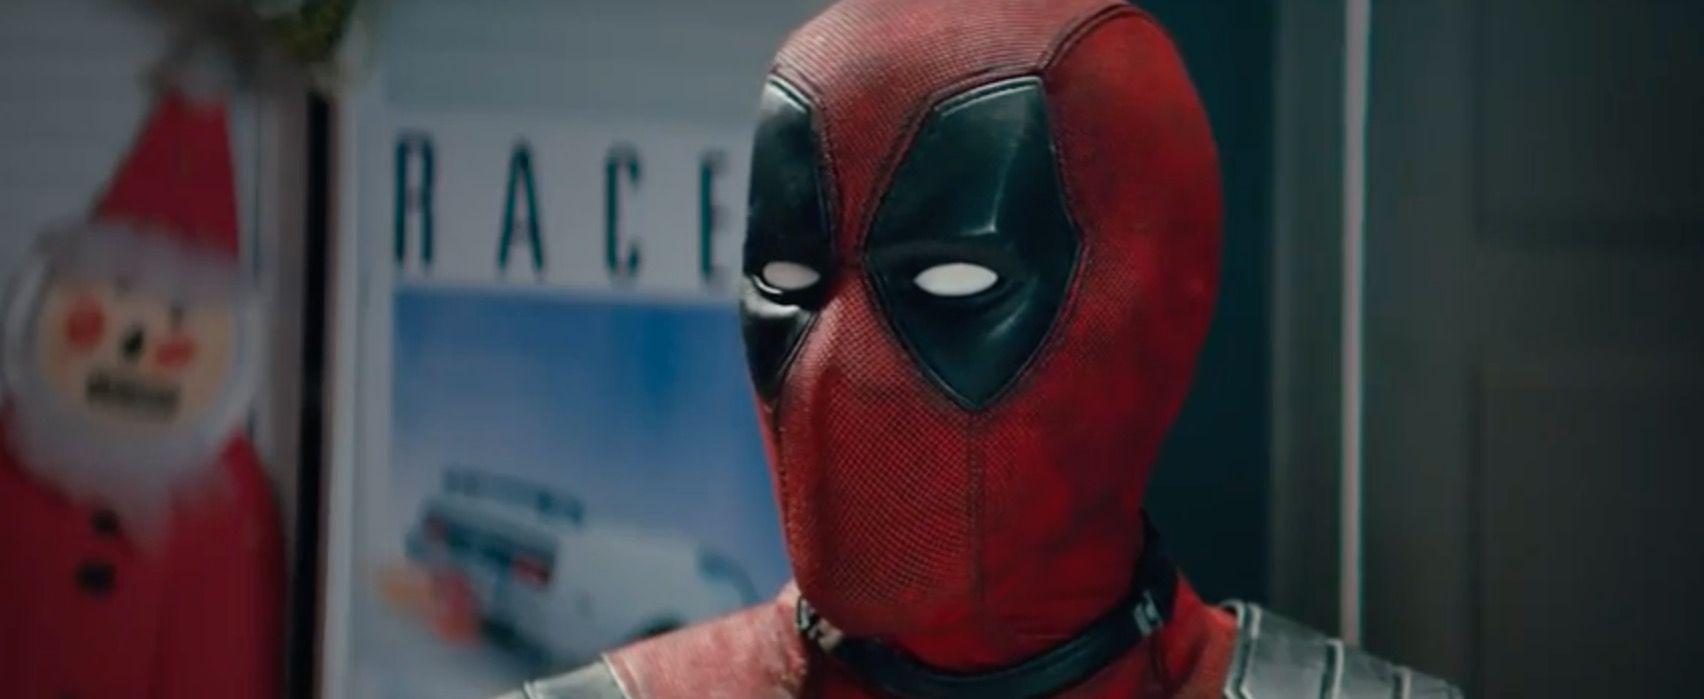 deadpool 2 full movie download hd in hindi